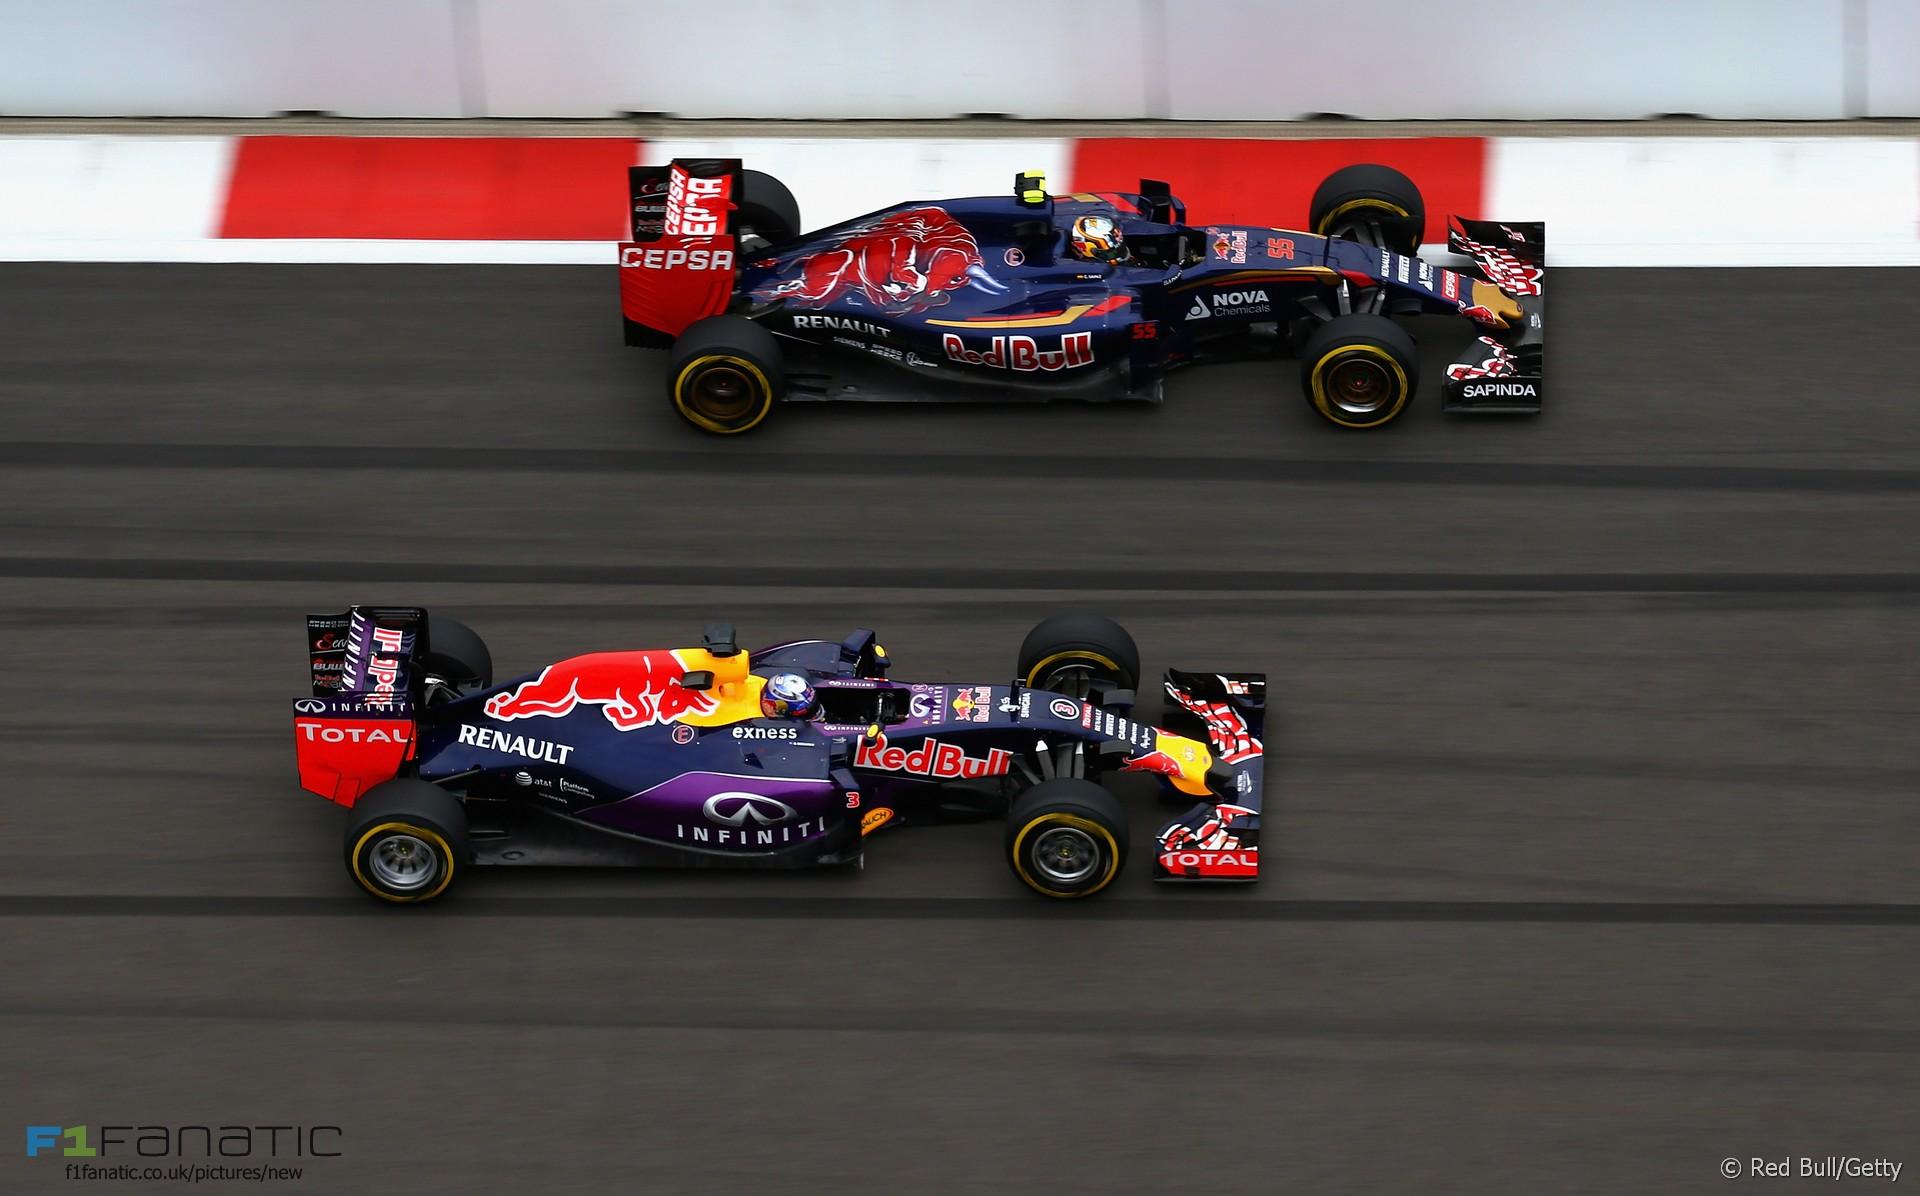 Daniel Ricciardo, Carlos Sainz Jnr, Sochi Autodrom, 2015